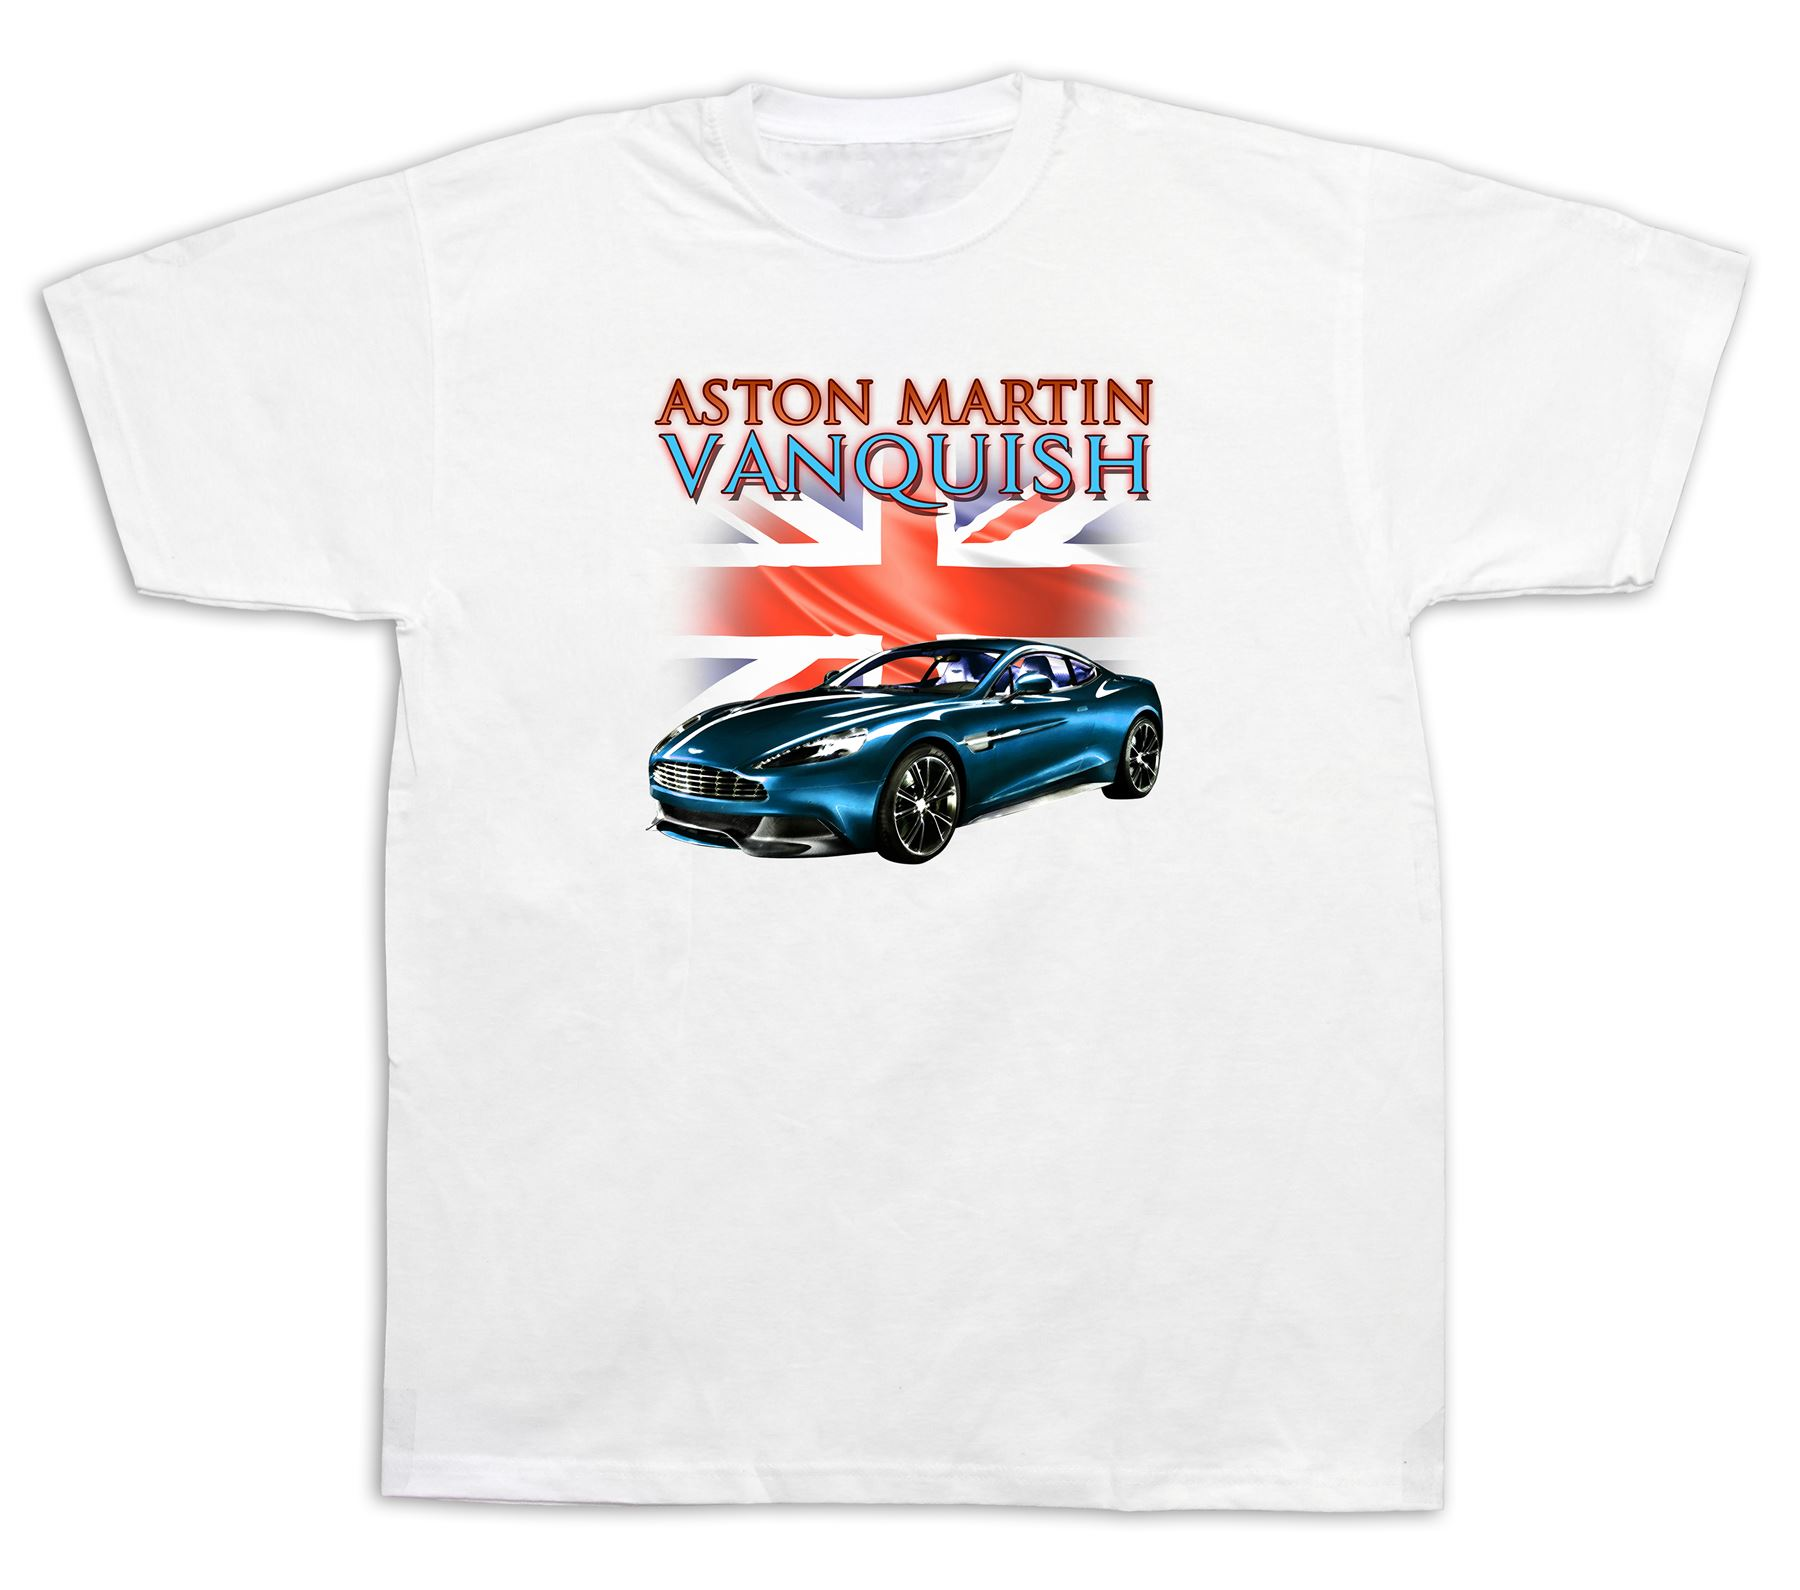 New Mens Cotton T Shirt Print Aston Martin Vanquish